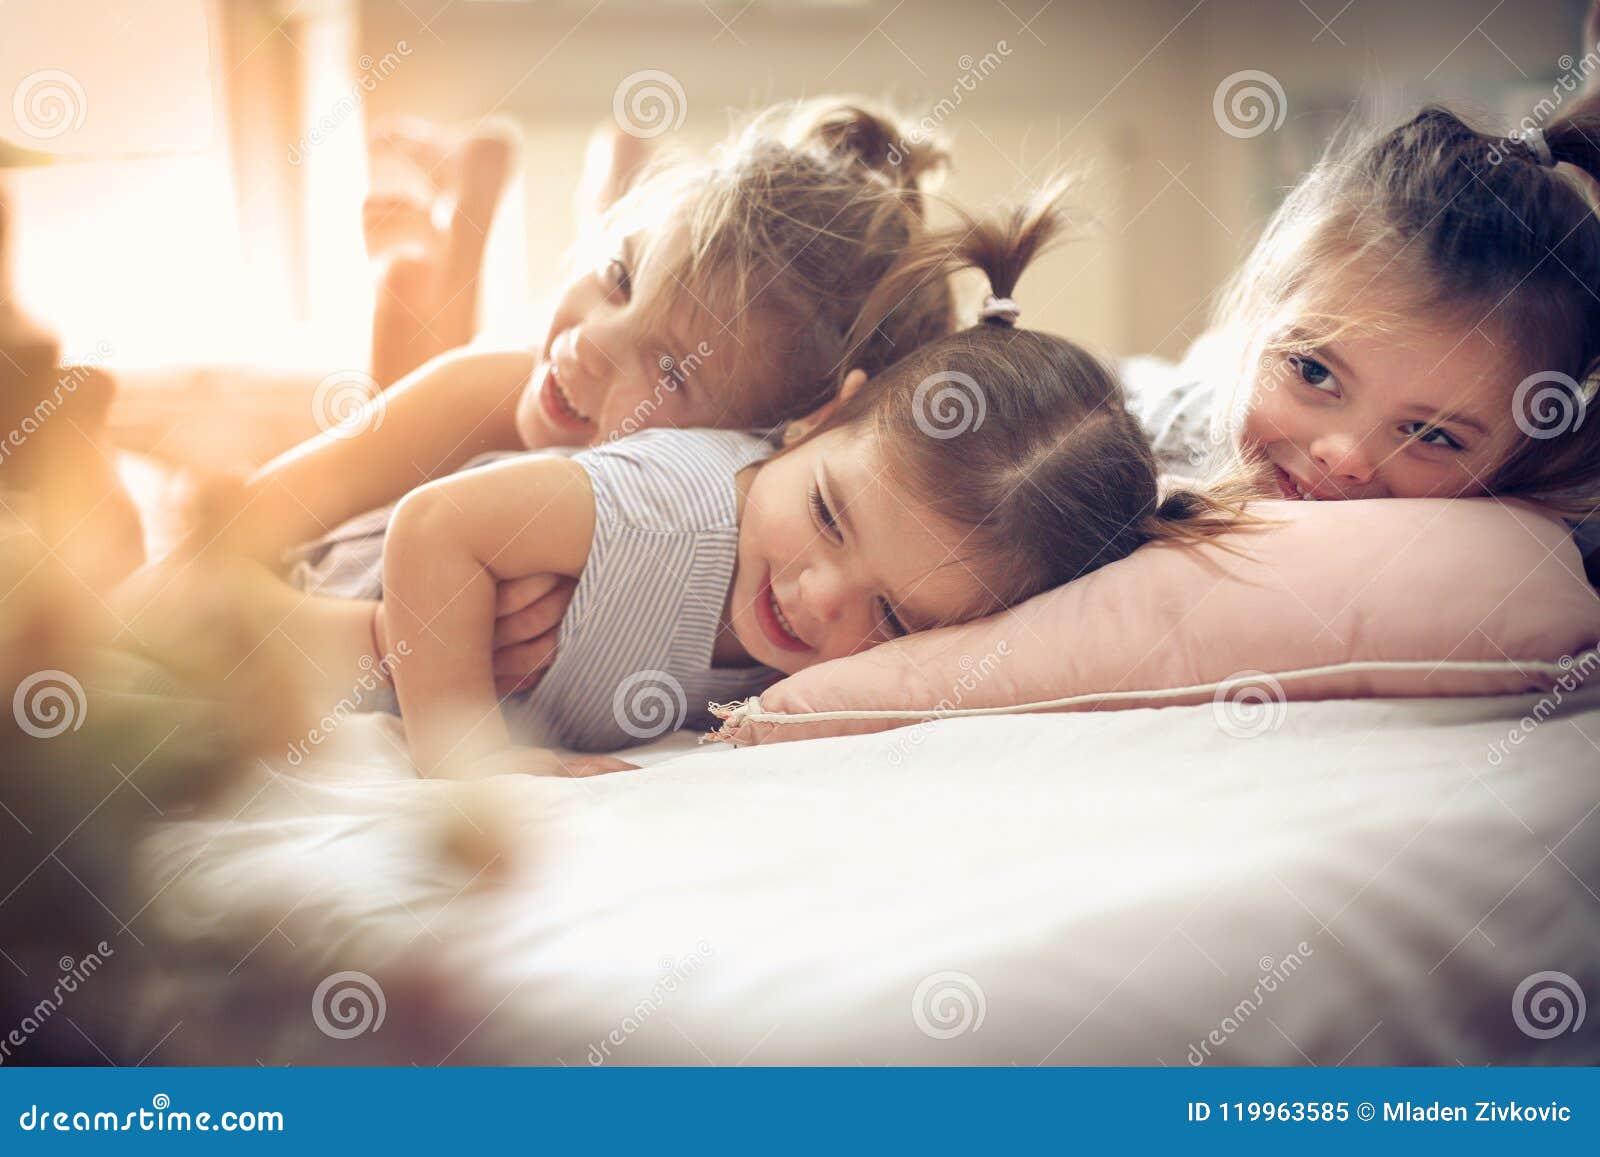 Three little girls in bed.